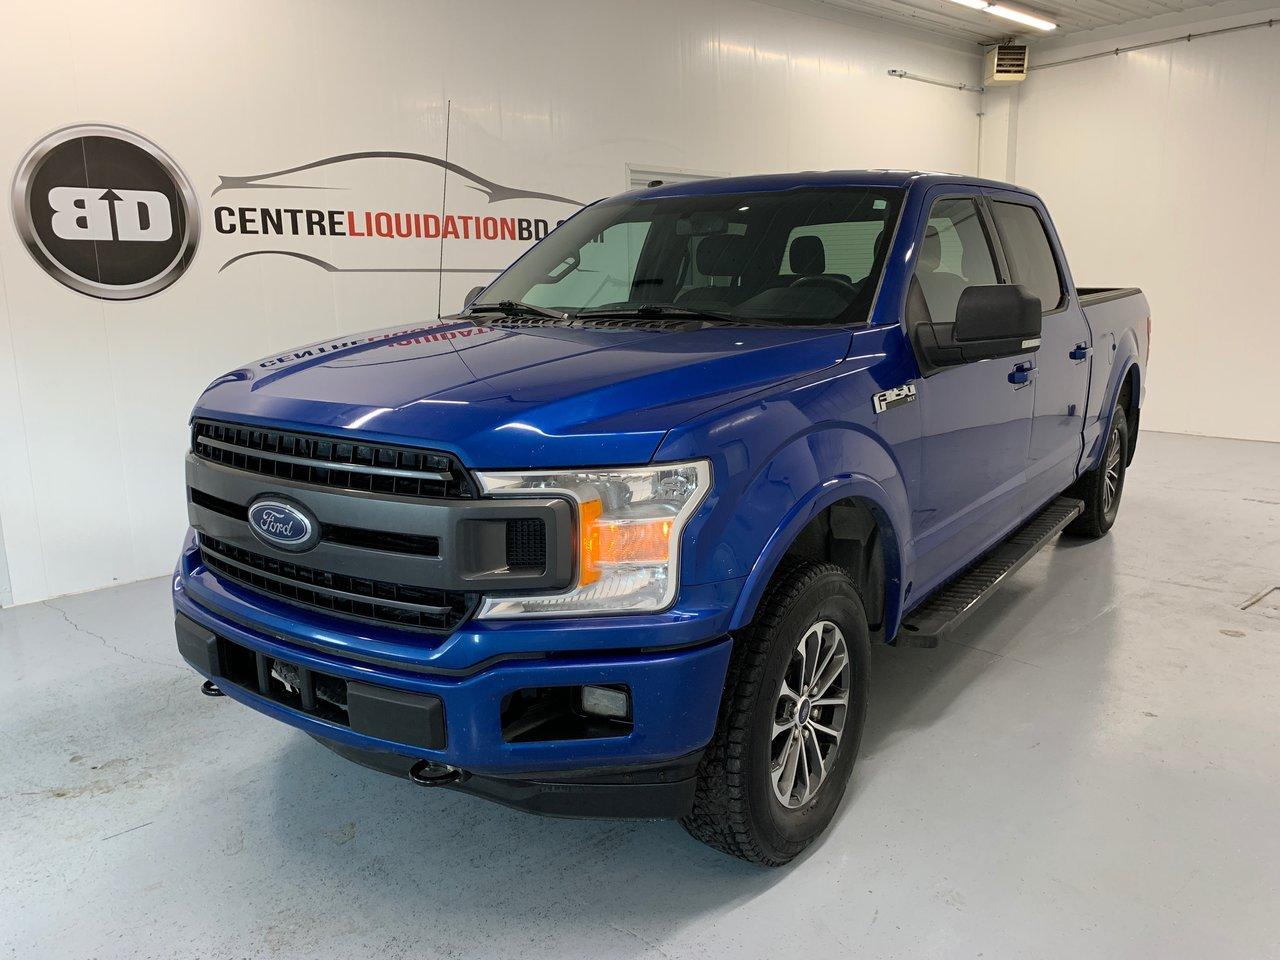 Ford F-150 2018 XLT FX4 CREW CAB V8 5.0L